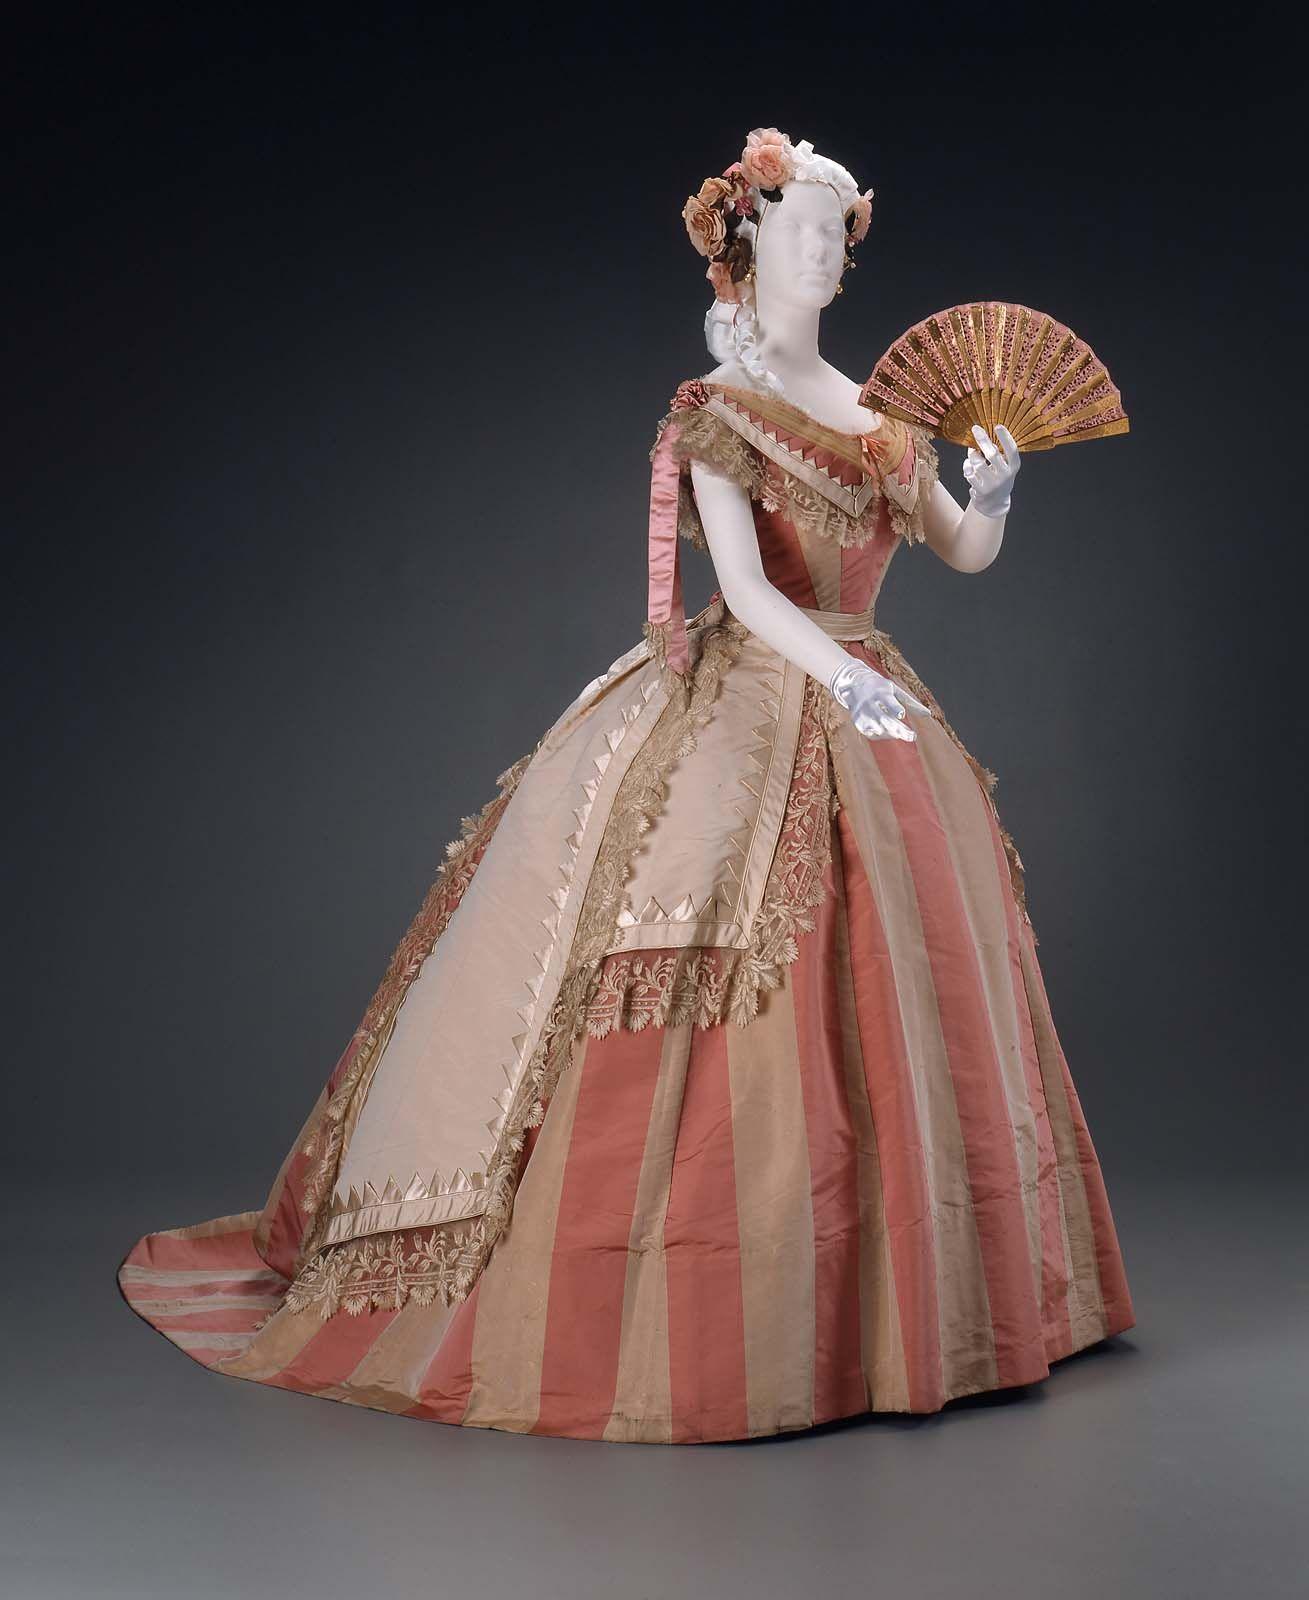 Evening dress mme roger c victorian fashion crinoline